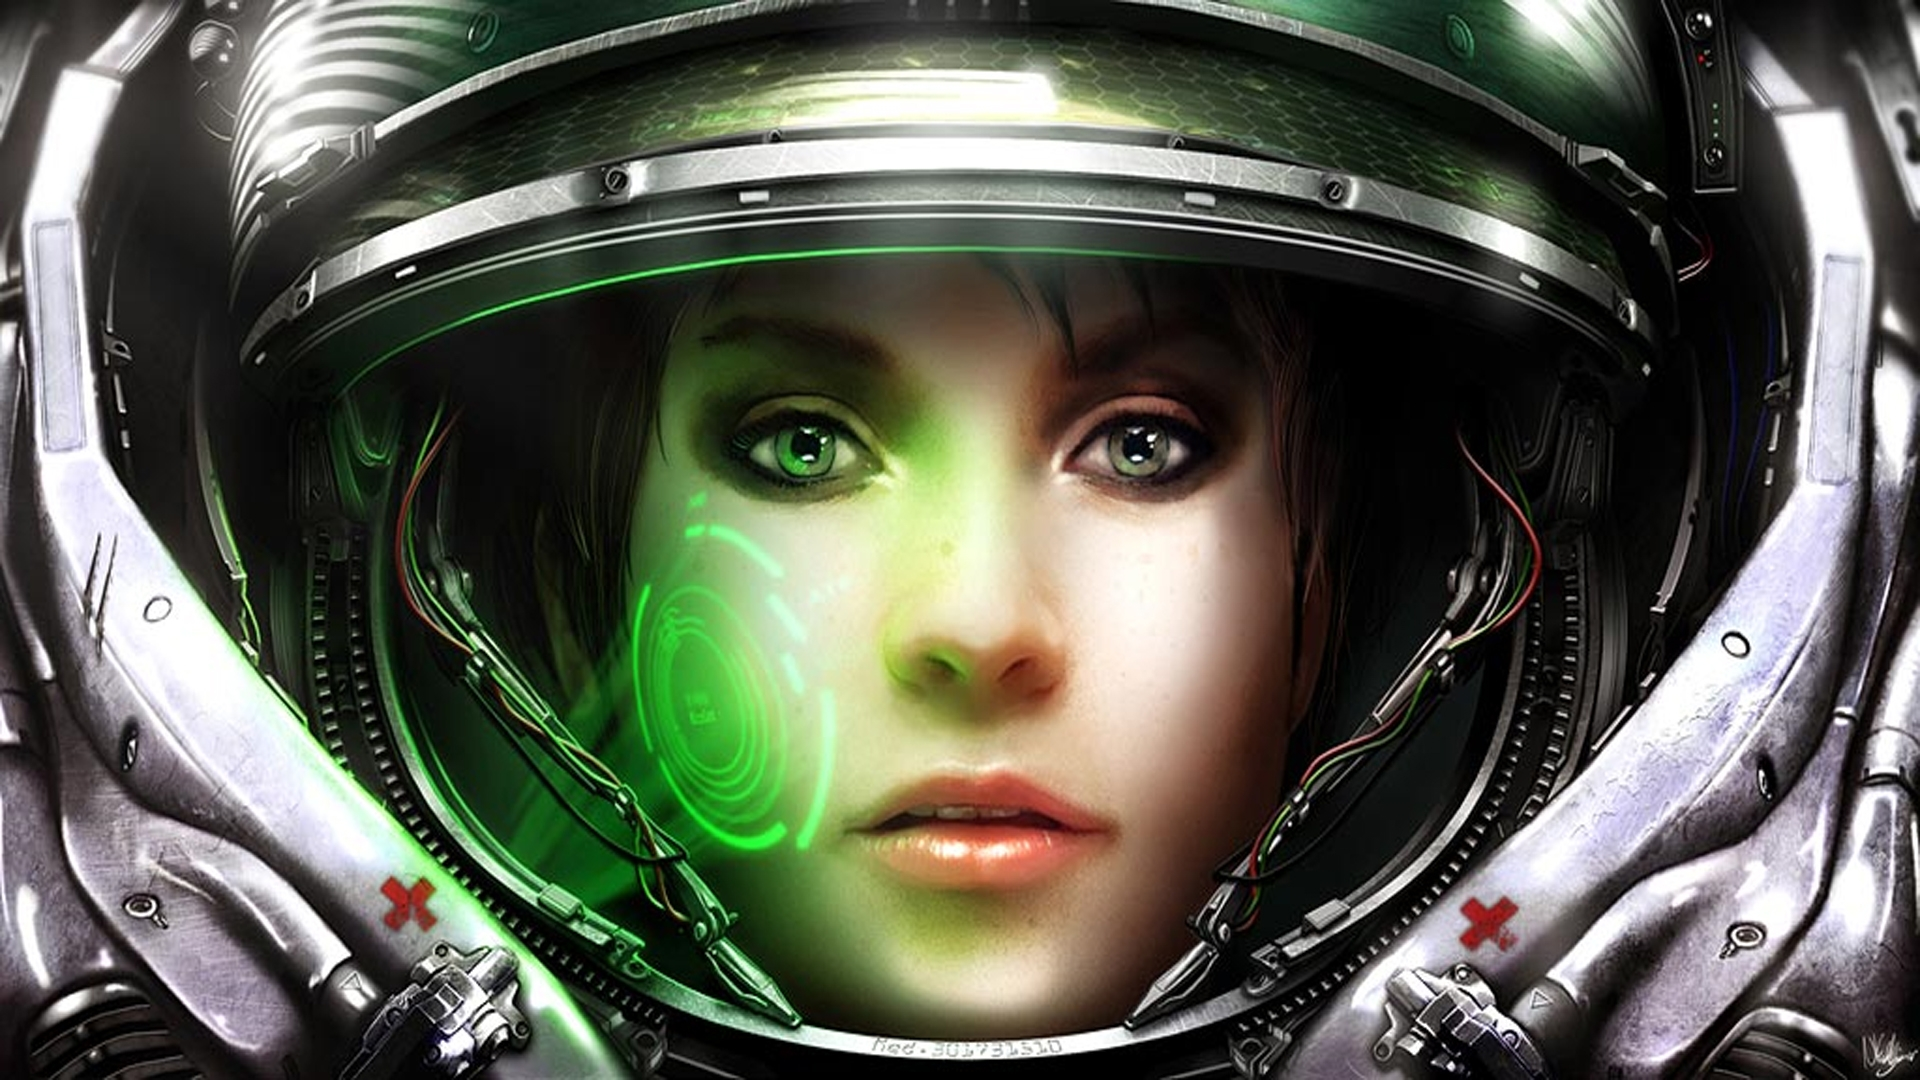 starcraft-soldier-armor-http-www-u-org-starcraft-soldier-armor-wallpaper-wp36010885